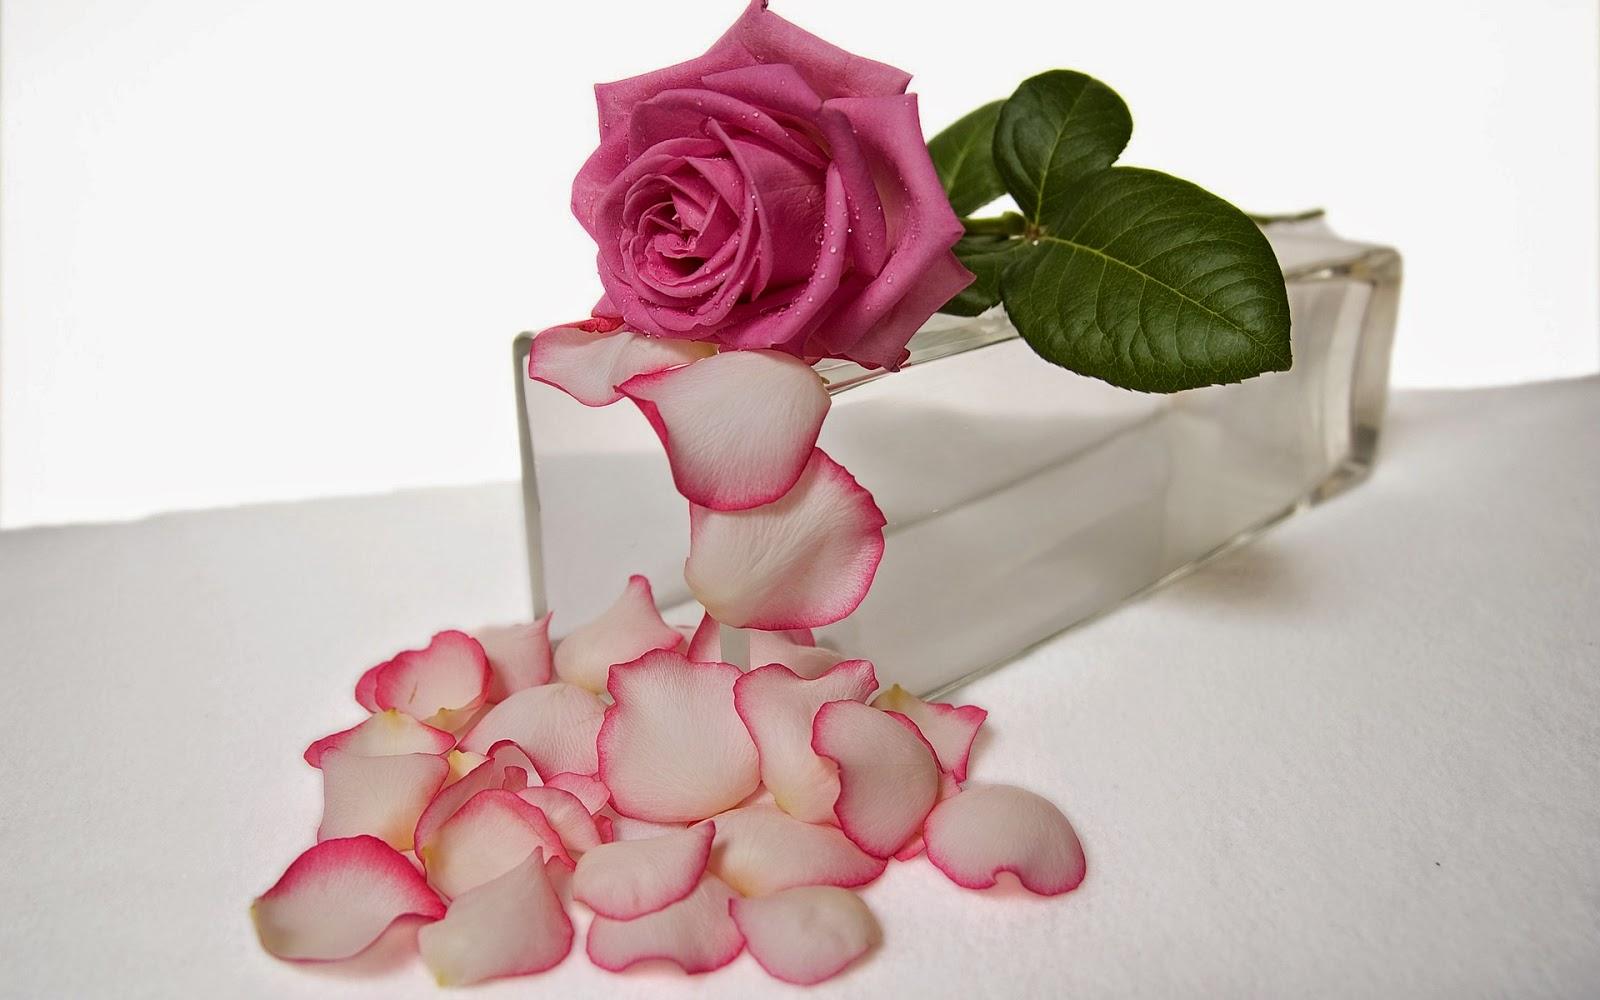 Pink Rose Hd Wallpapers Flowershdwallpapers